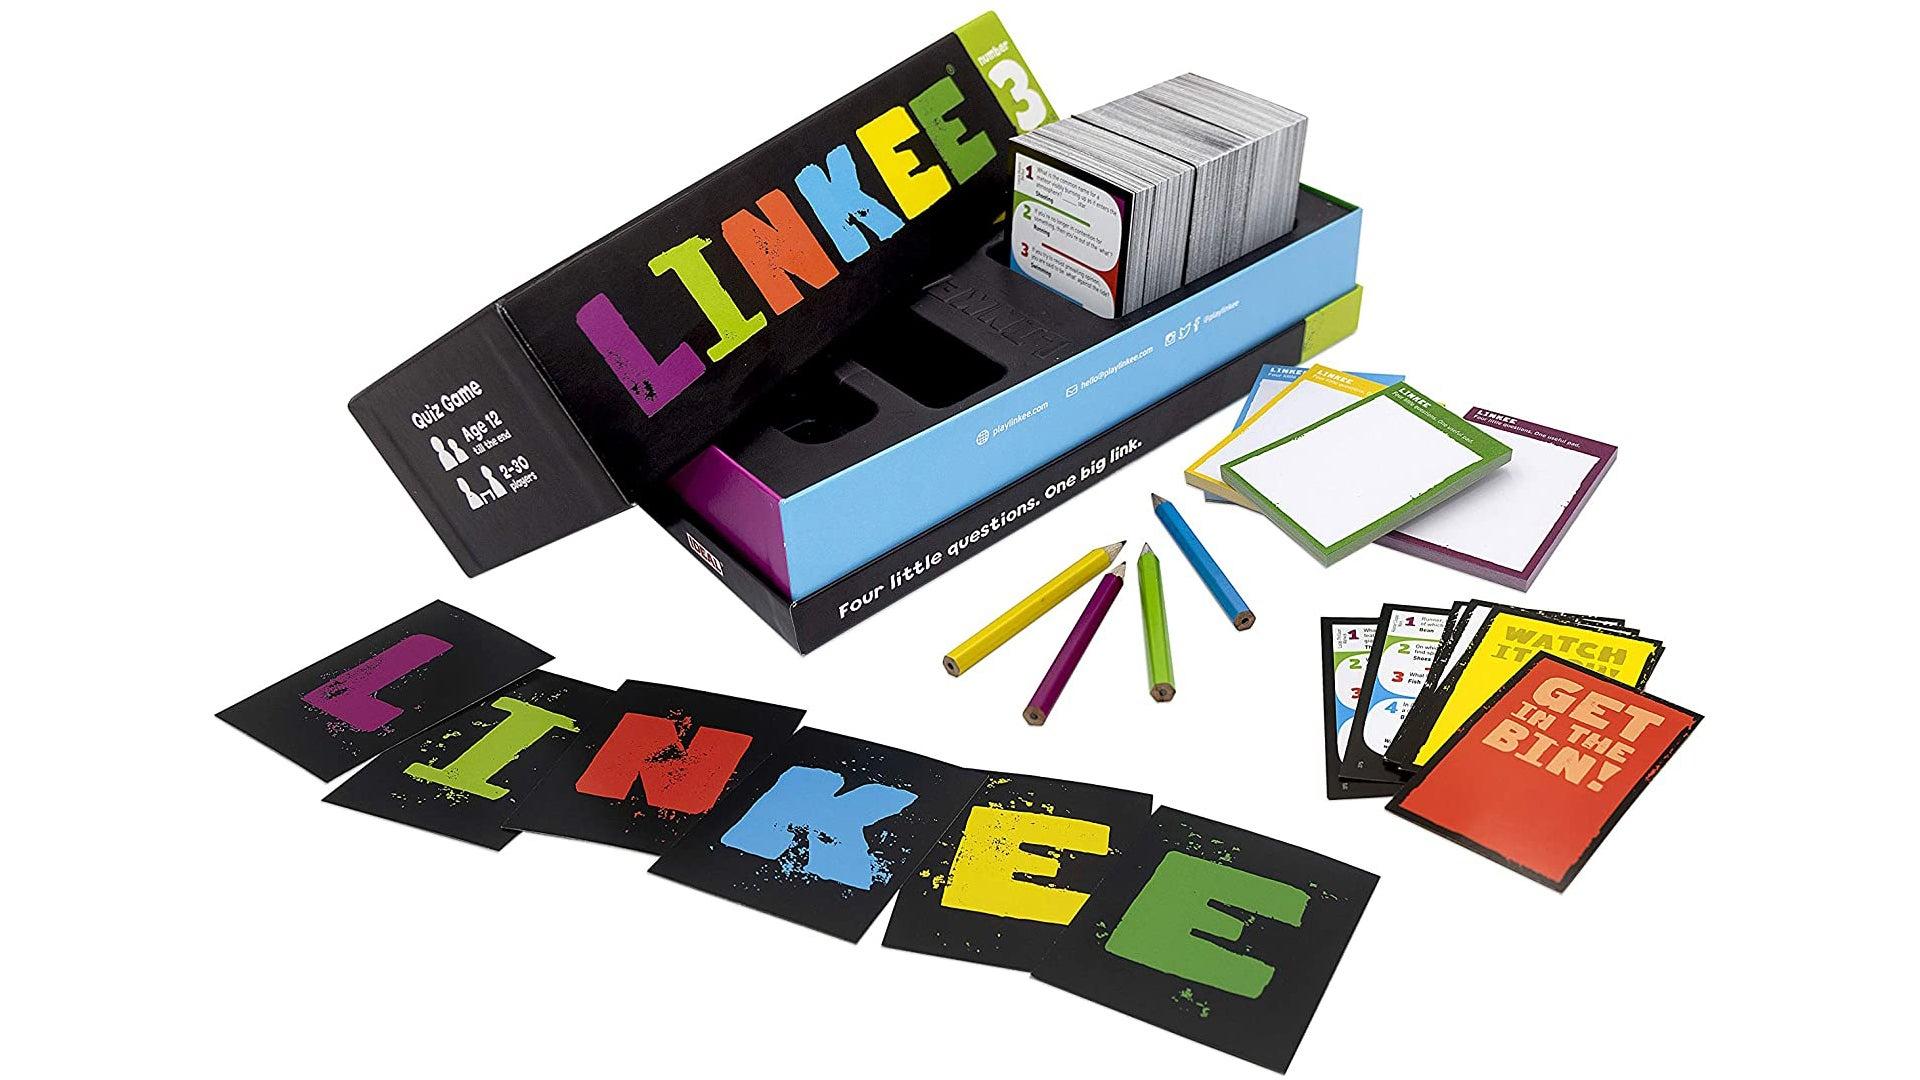 linkee-trivia-game.jpg